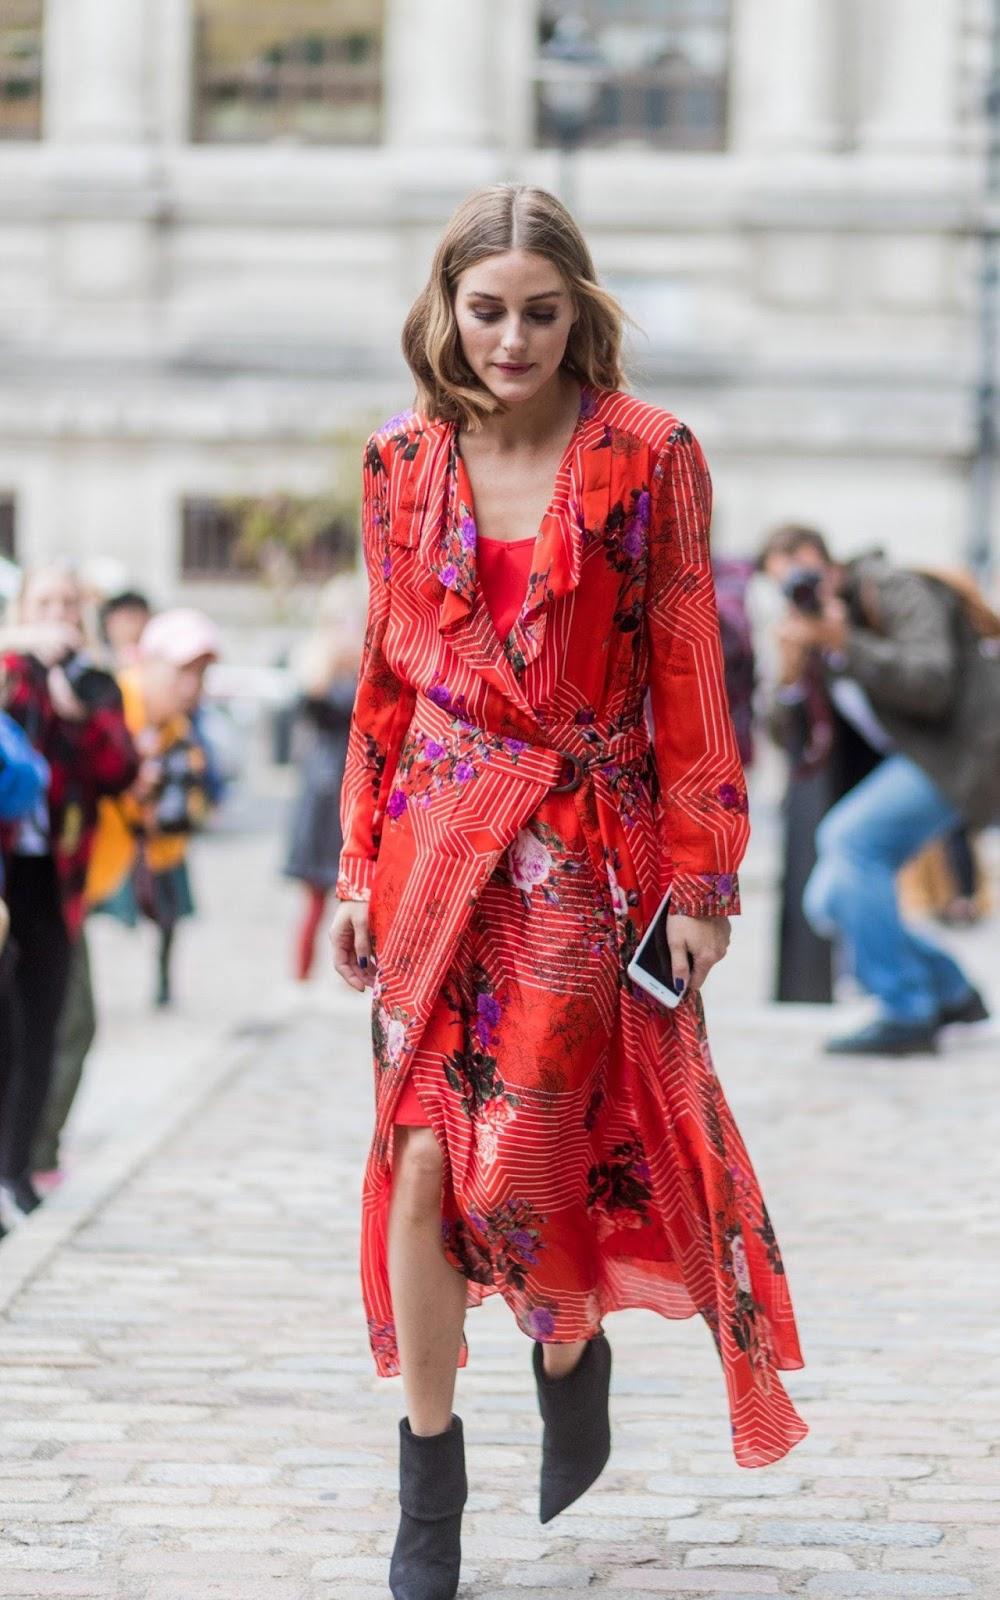 The Olivia Palermo Lookbook Olivia Palermo At London Fashion Week Iv